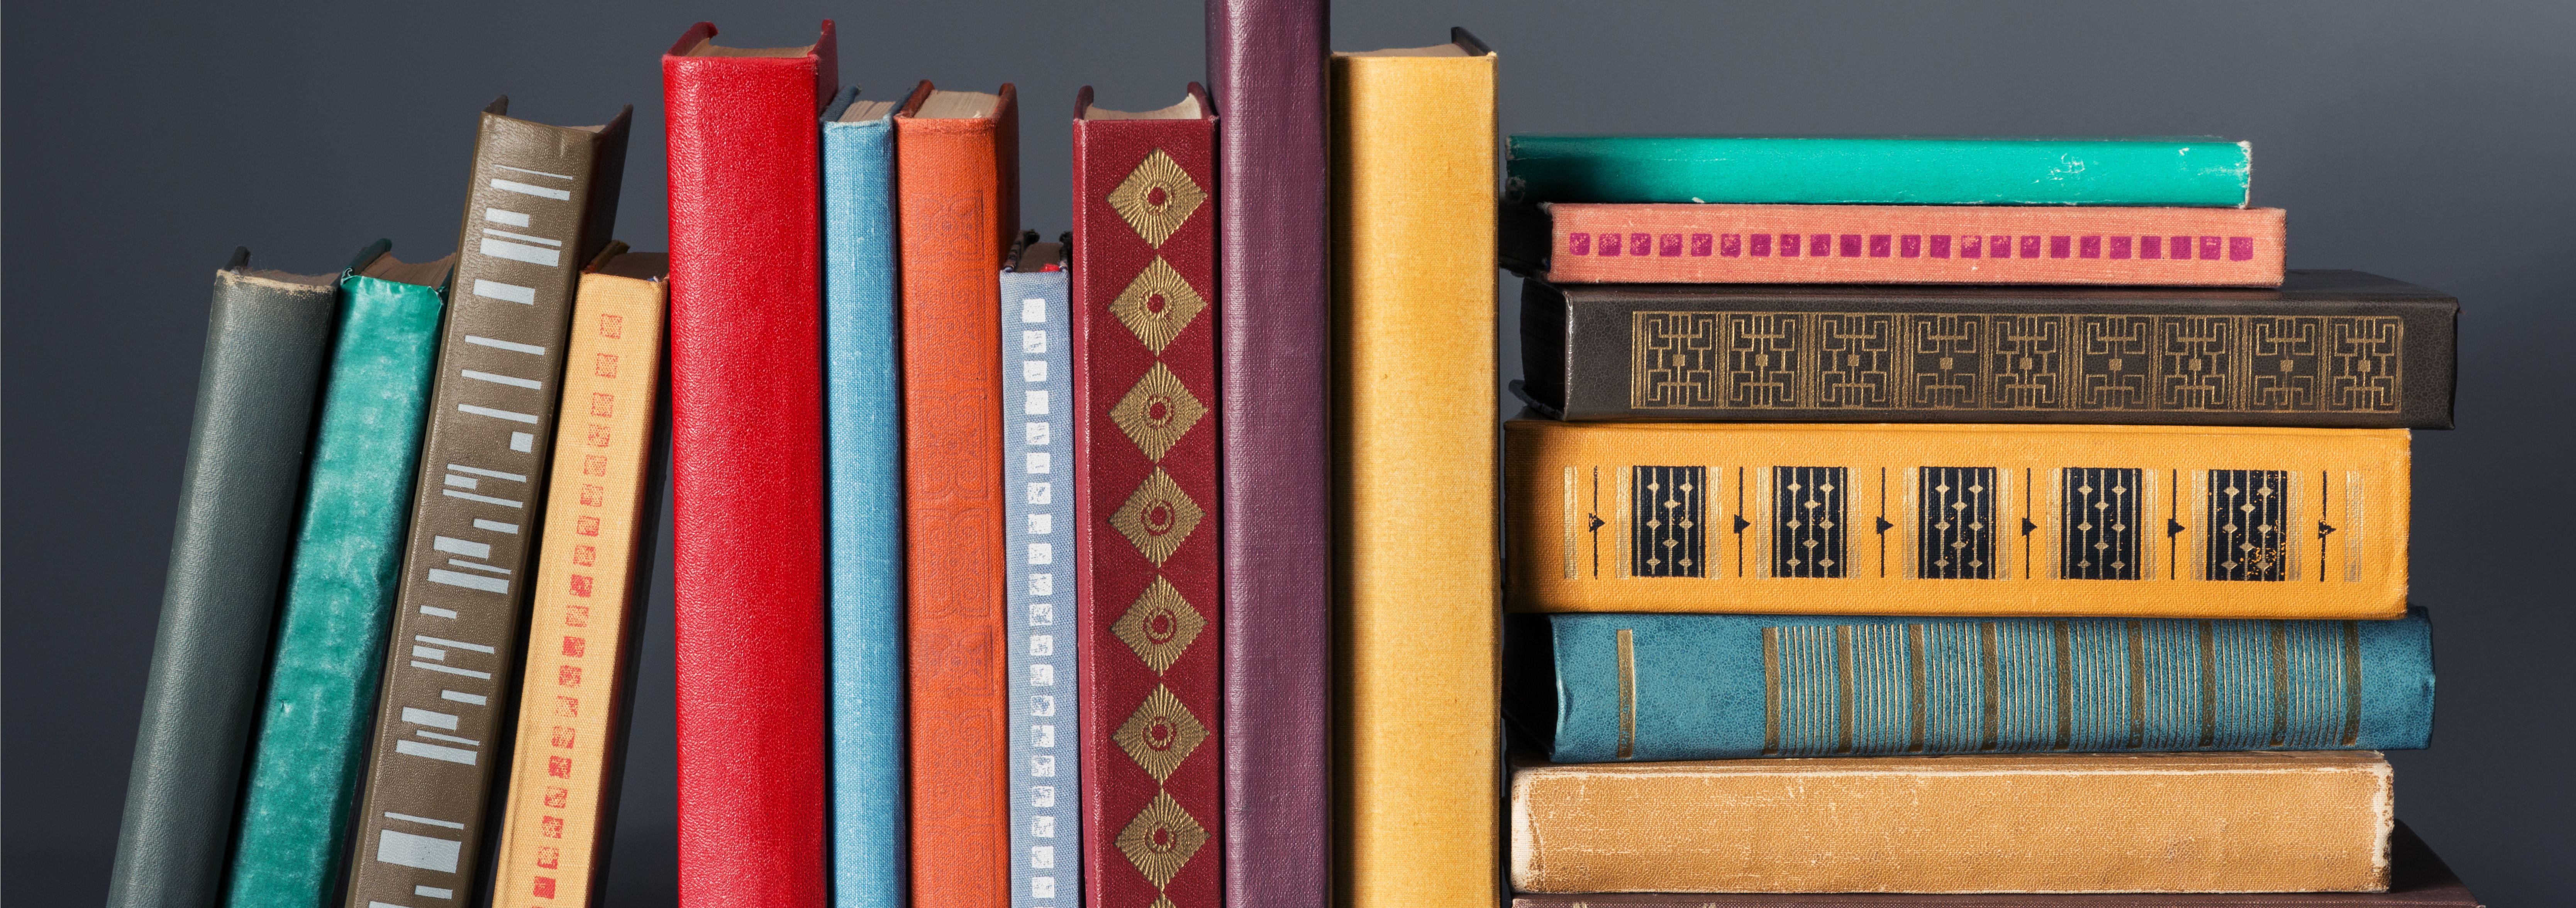 Books and textbooks on the bookshelf. 3d